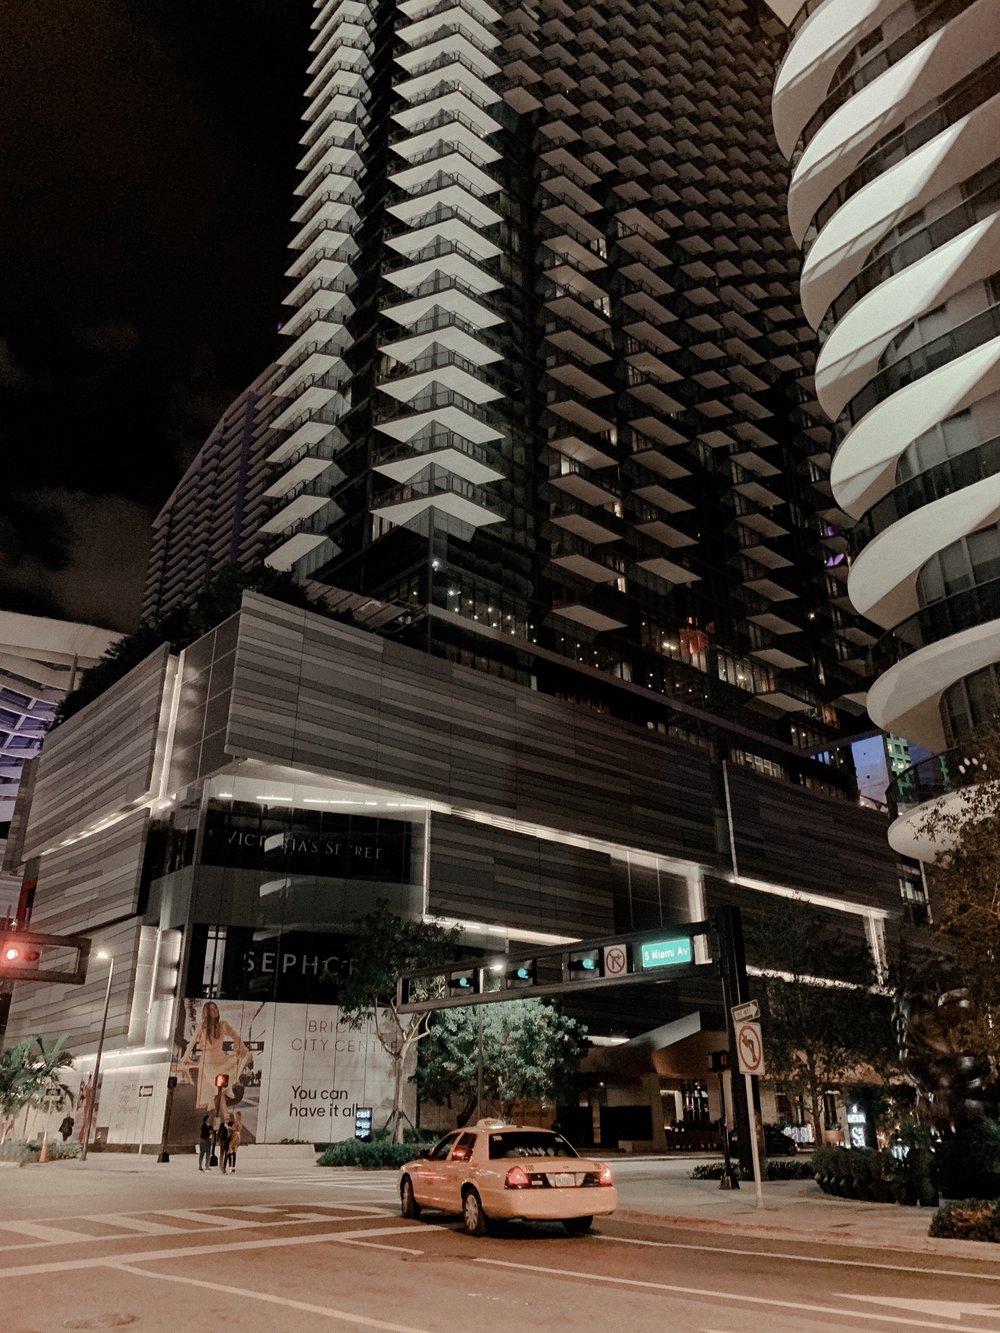 Our First Night in Miami - Brickell City Centre